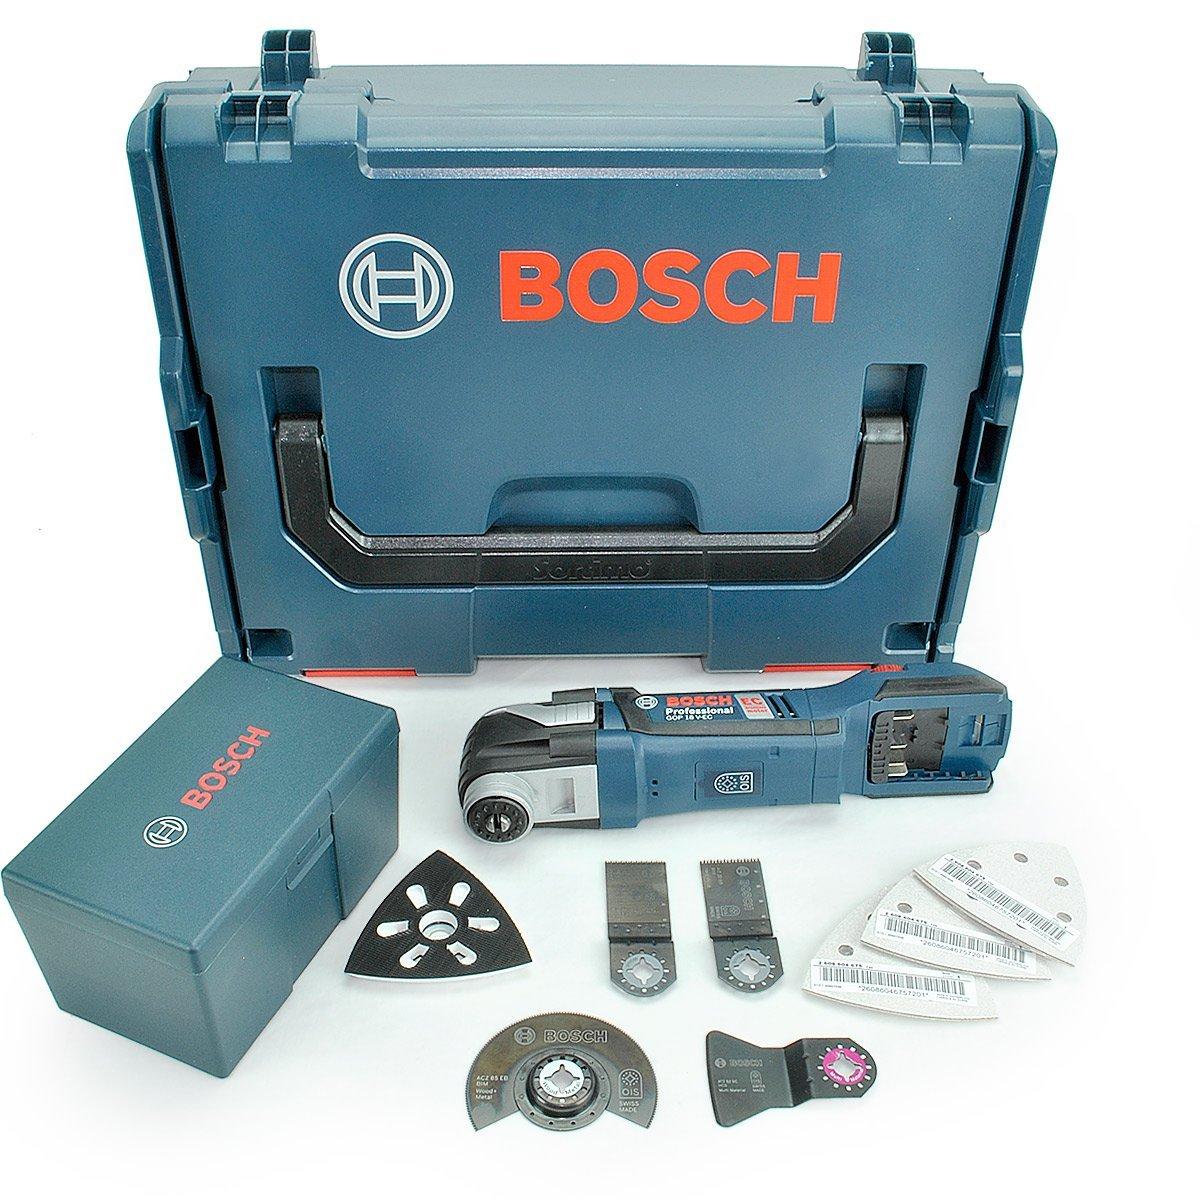 [Rakuten] Bosch Akku-Multi-Cutter GOP 18 V-EC, Solo Version, L-BOXX PVG 179€